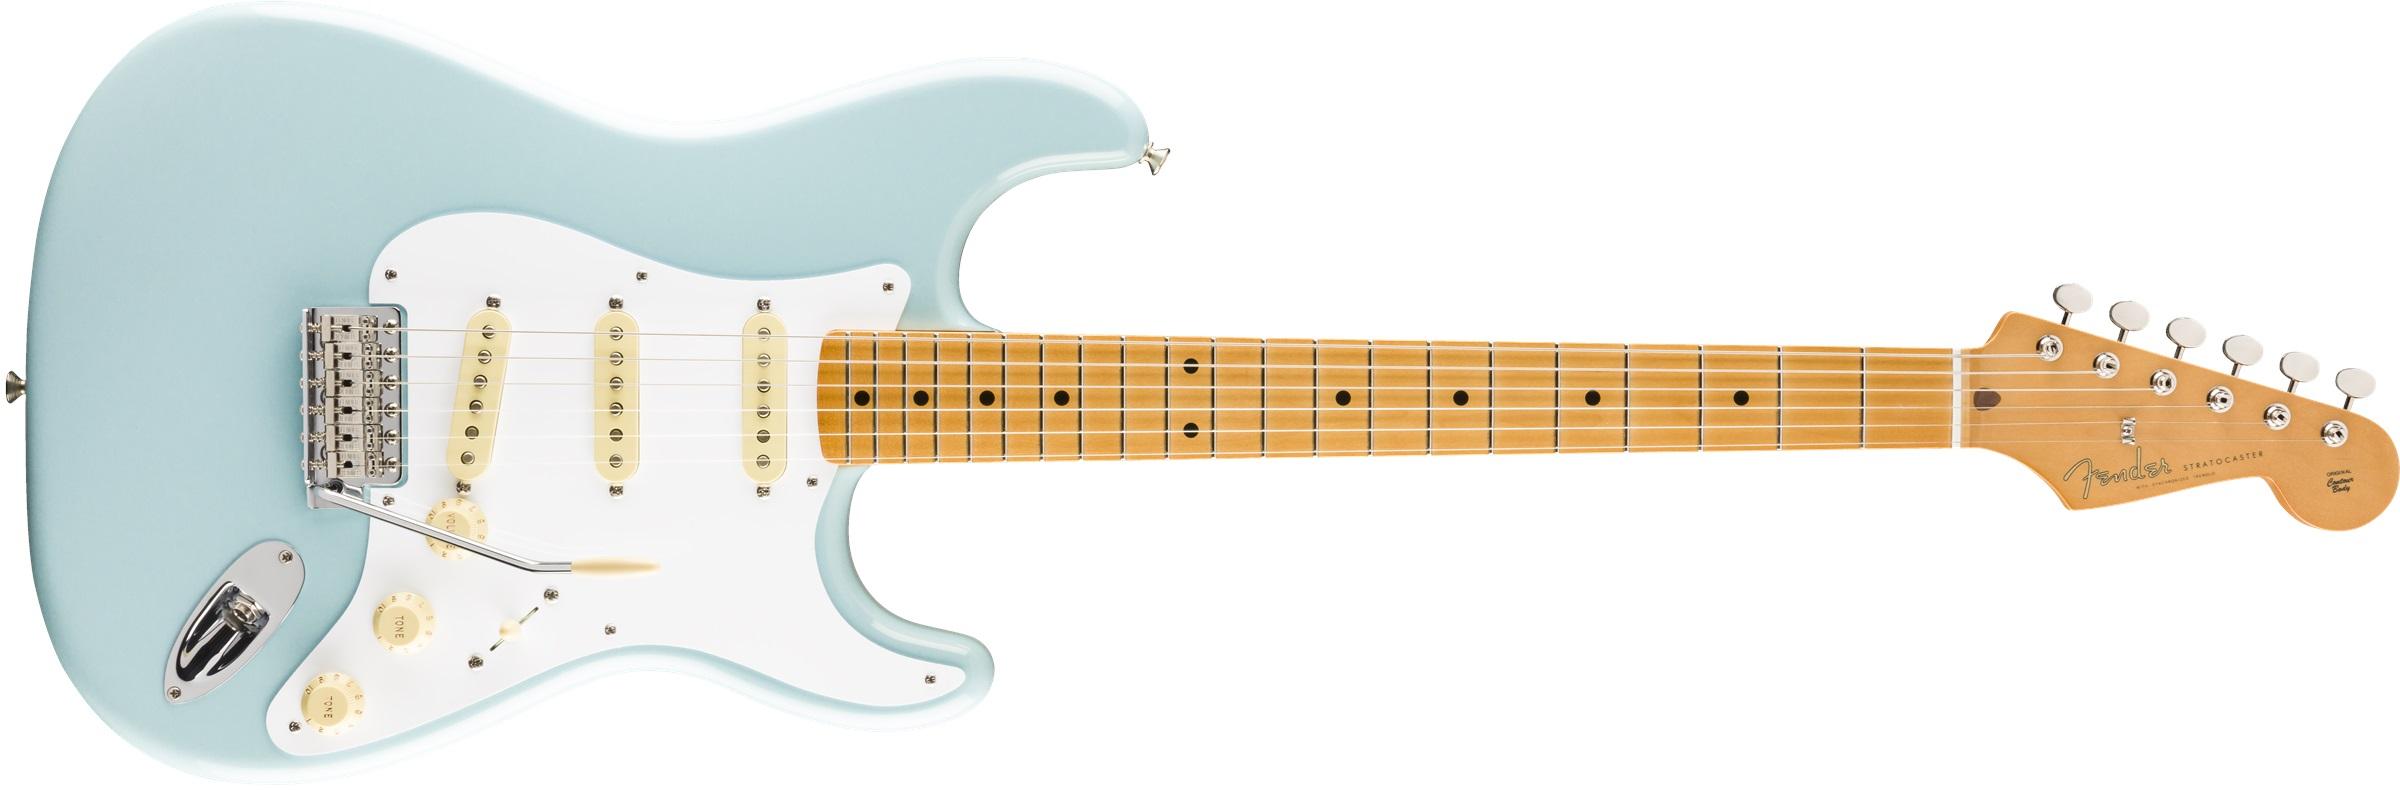 Fender Vintera 50s Stratocaster MN SB